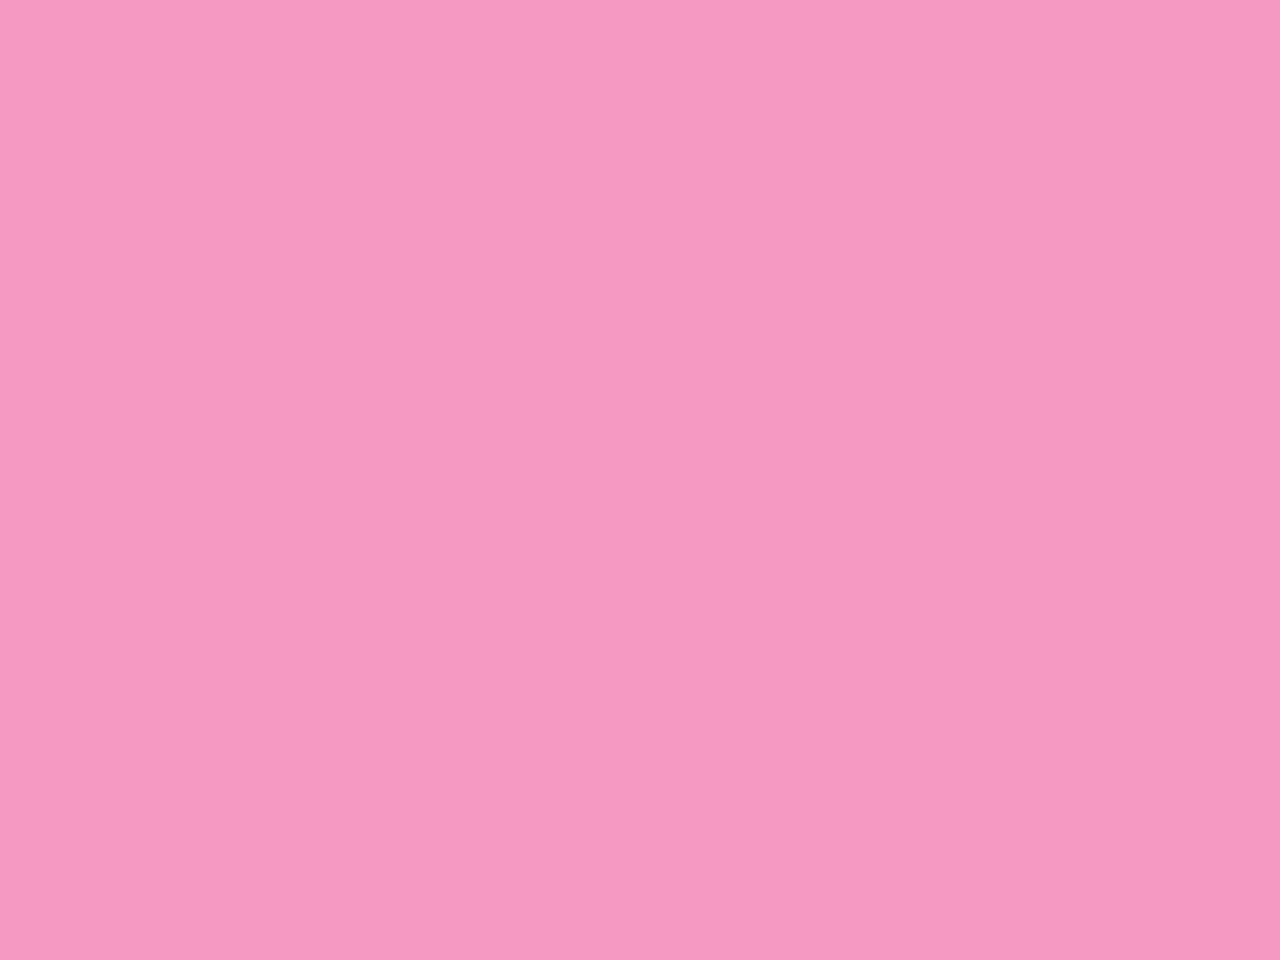 1280x960 Pastel Magenta Solid Color Background